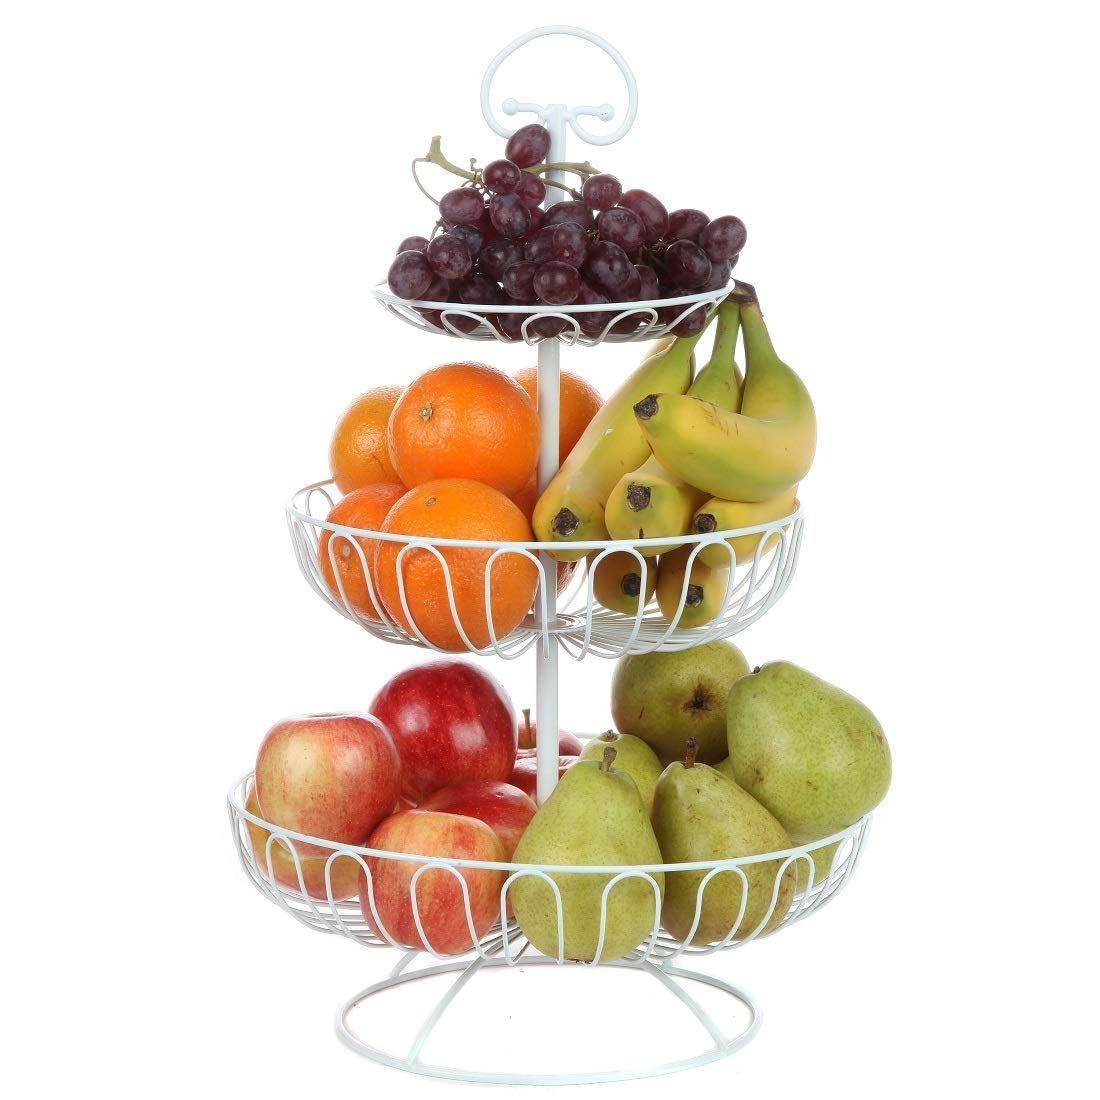 3 Tiered Fruit Basket